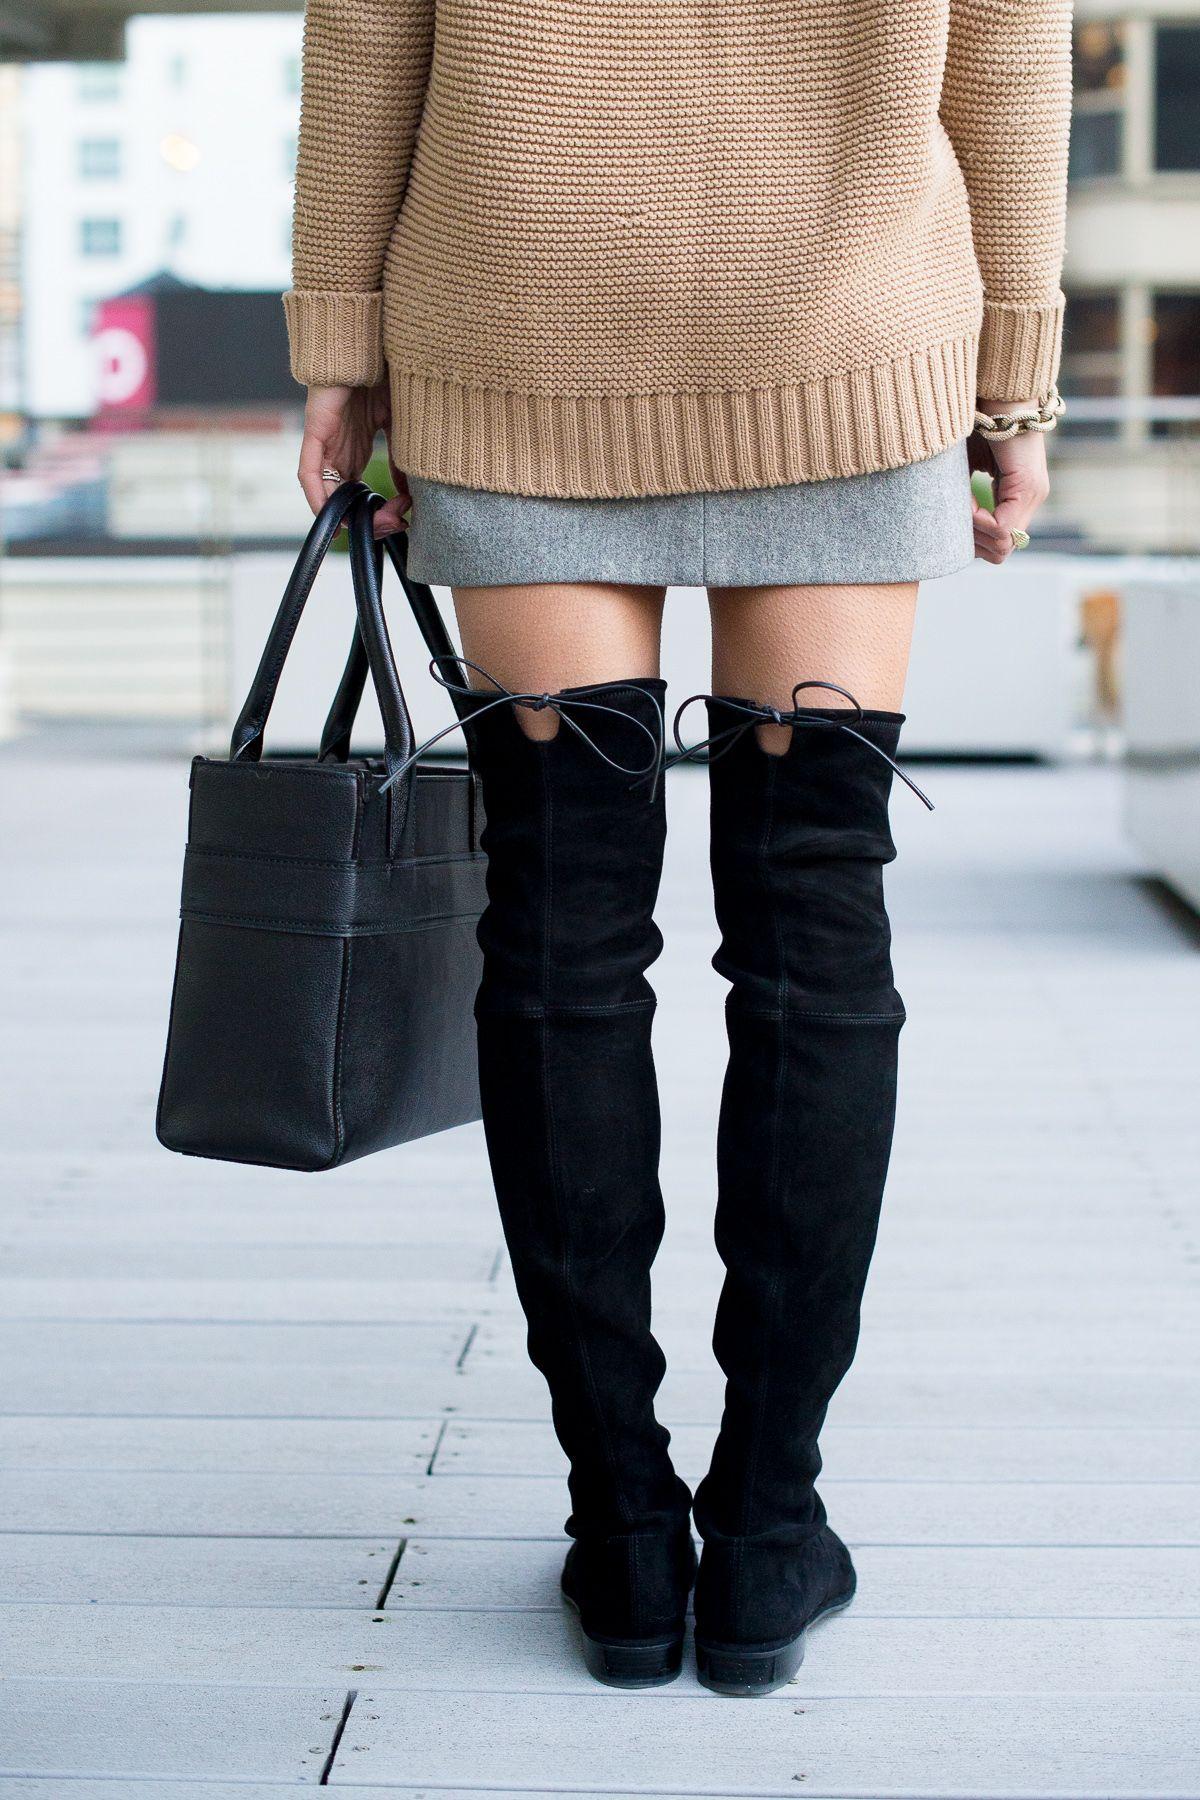 db92d4c4ab0bf Thigh High | Fox & She Style | Fall outfits, Boots, Fashion